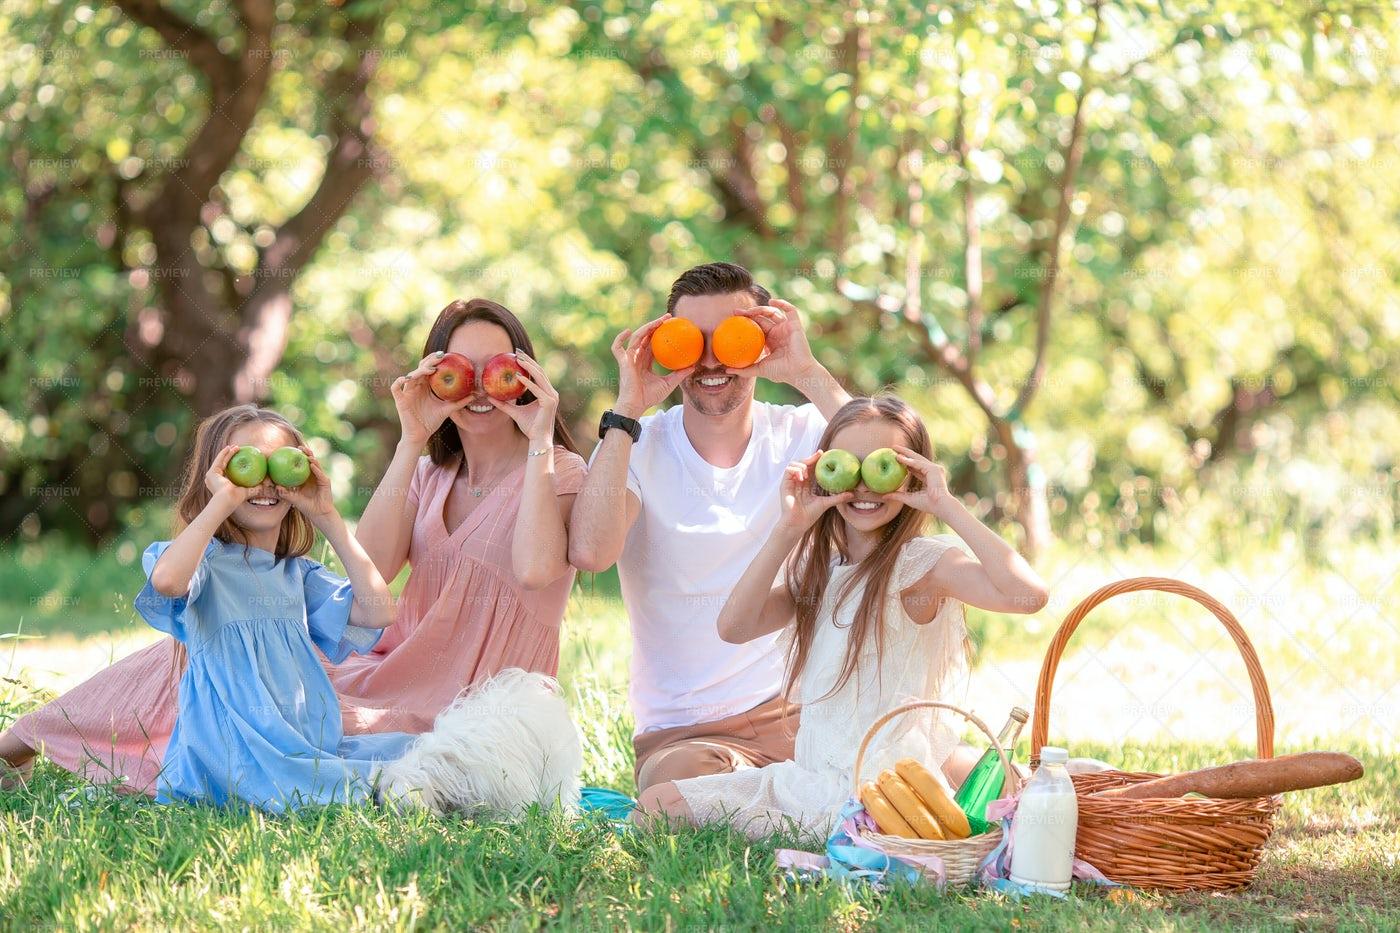 Funny Family Has A Picnic: Stock Photos